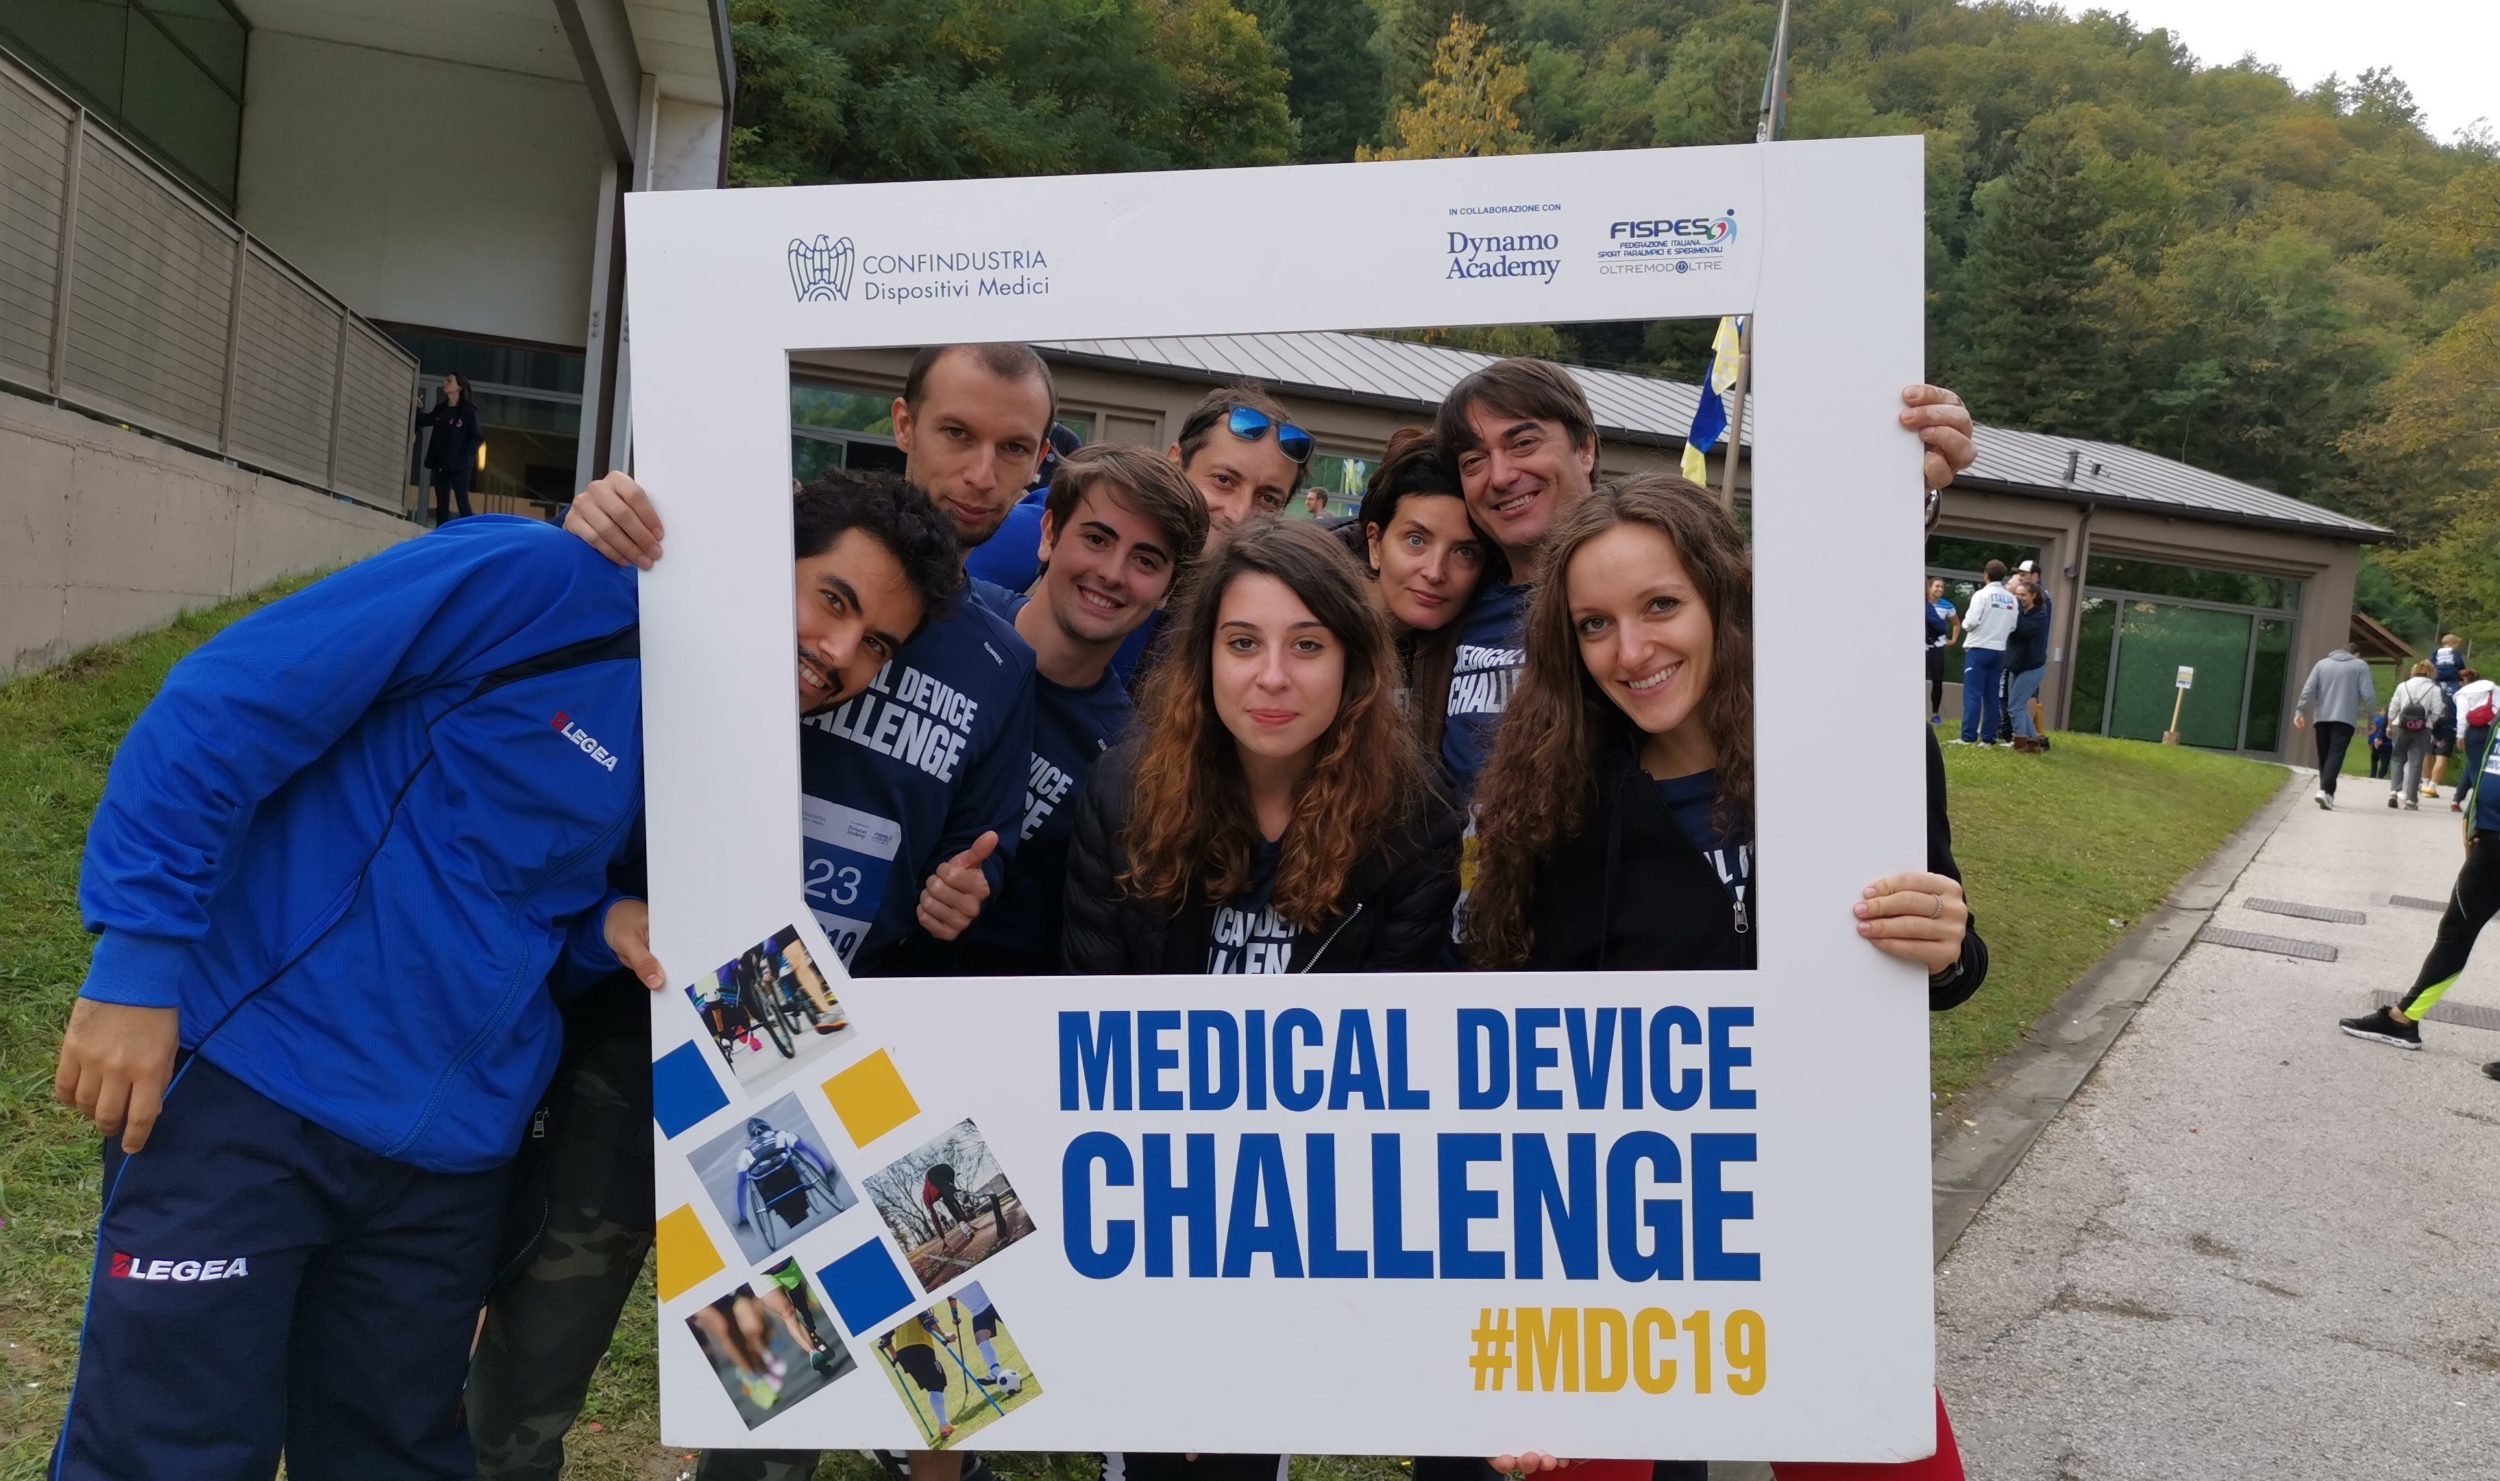 BOMI Group A Sostegno Di Dynamo Camp Con Confindustria Dispositivi Medici